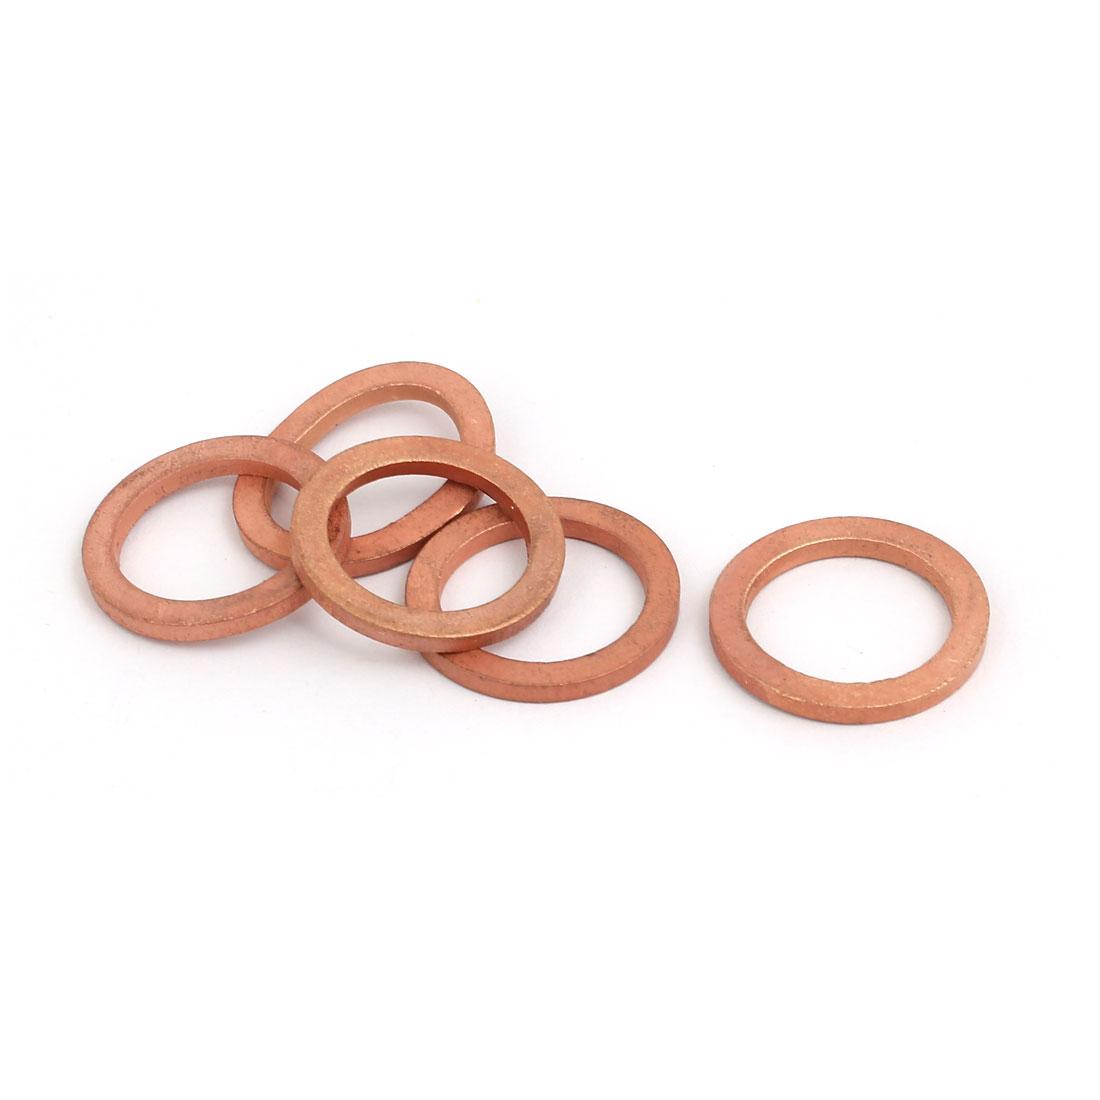 5pcs 16mmx22mmx2mm Copper Flat Ring Sealing Crush Washer Gasket